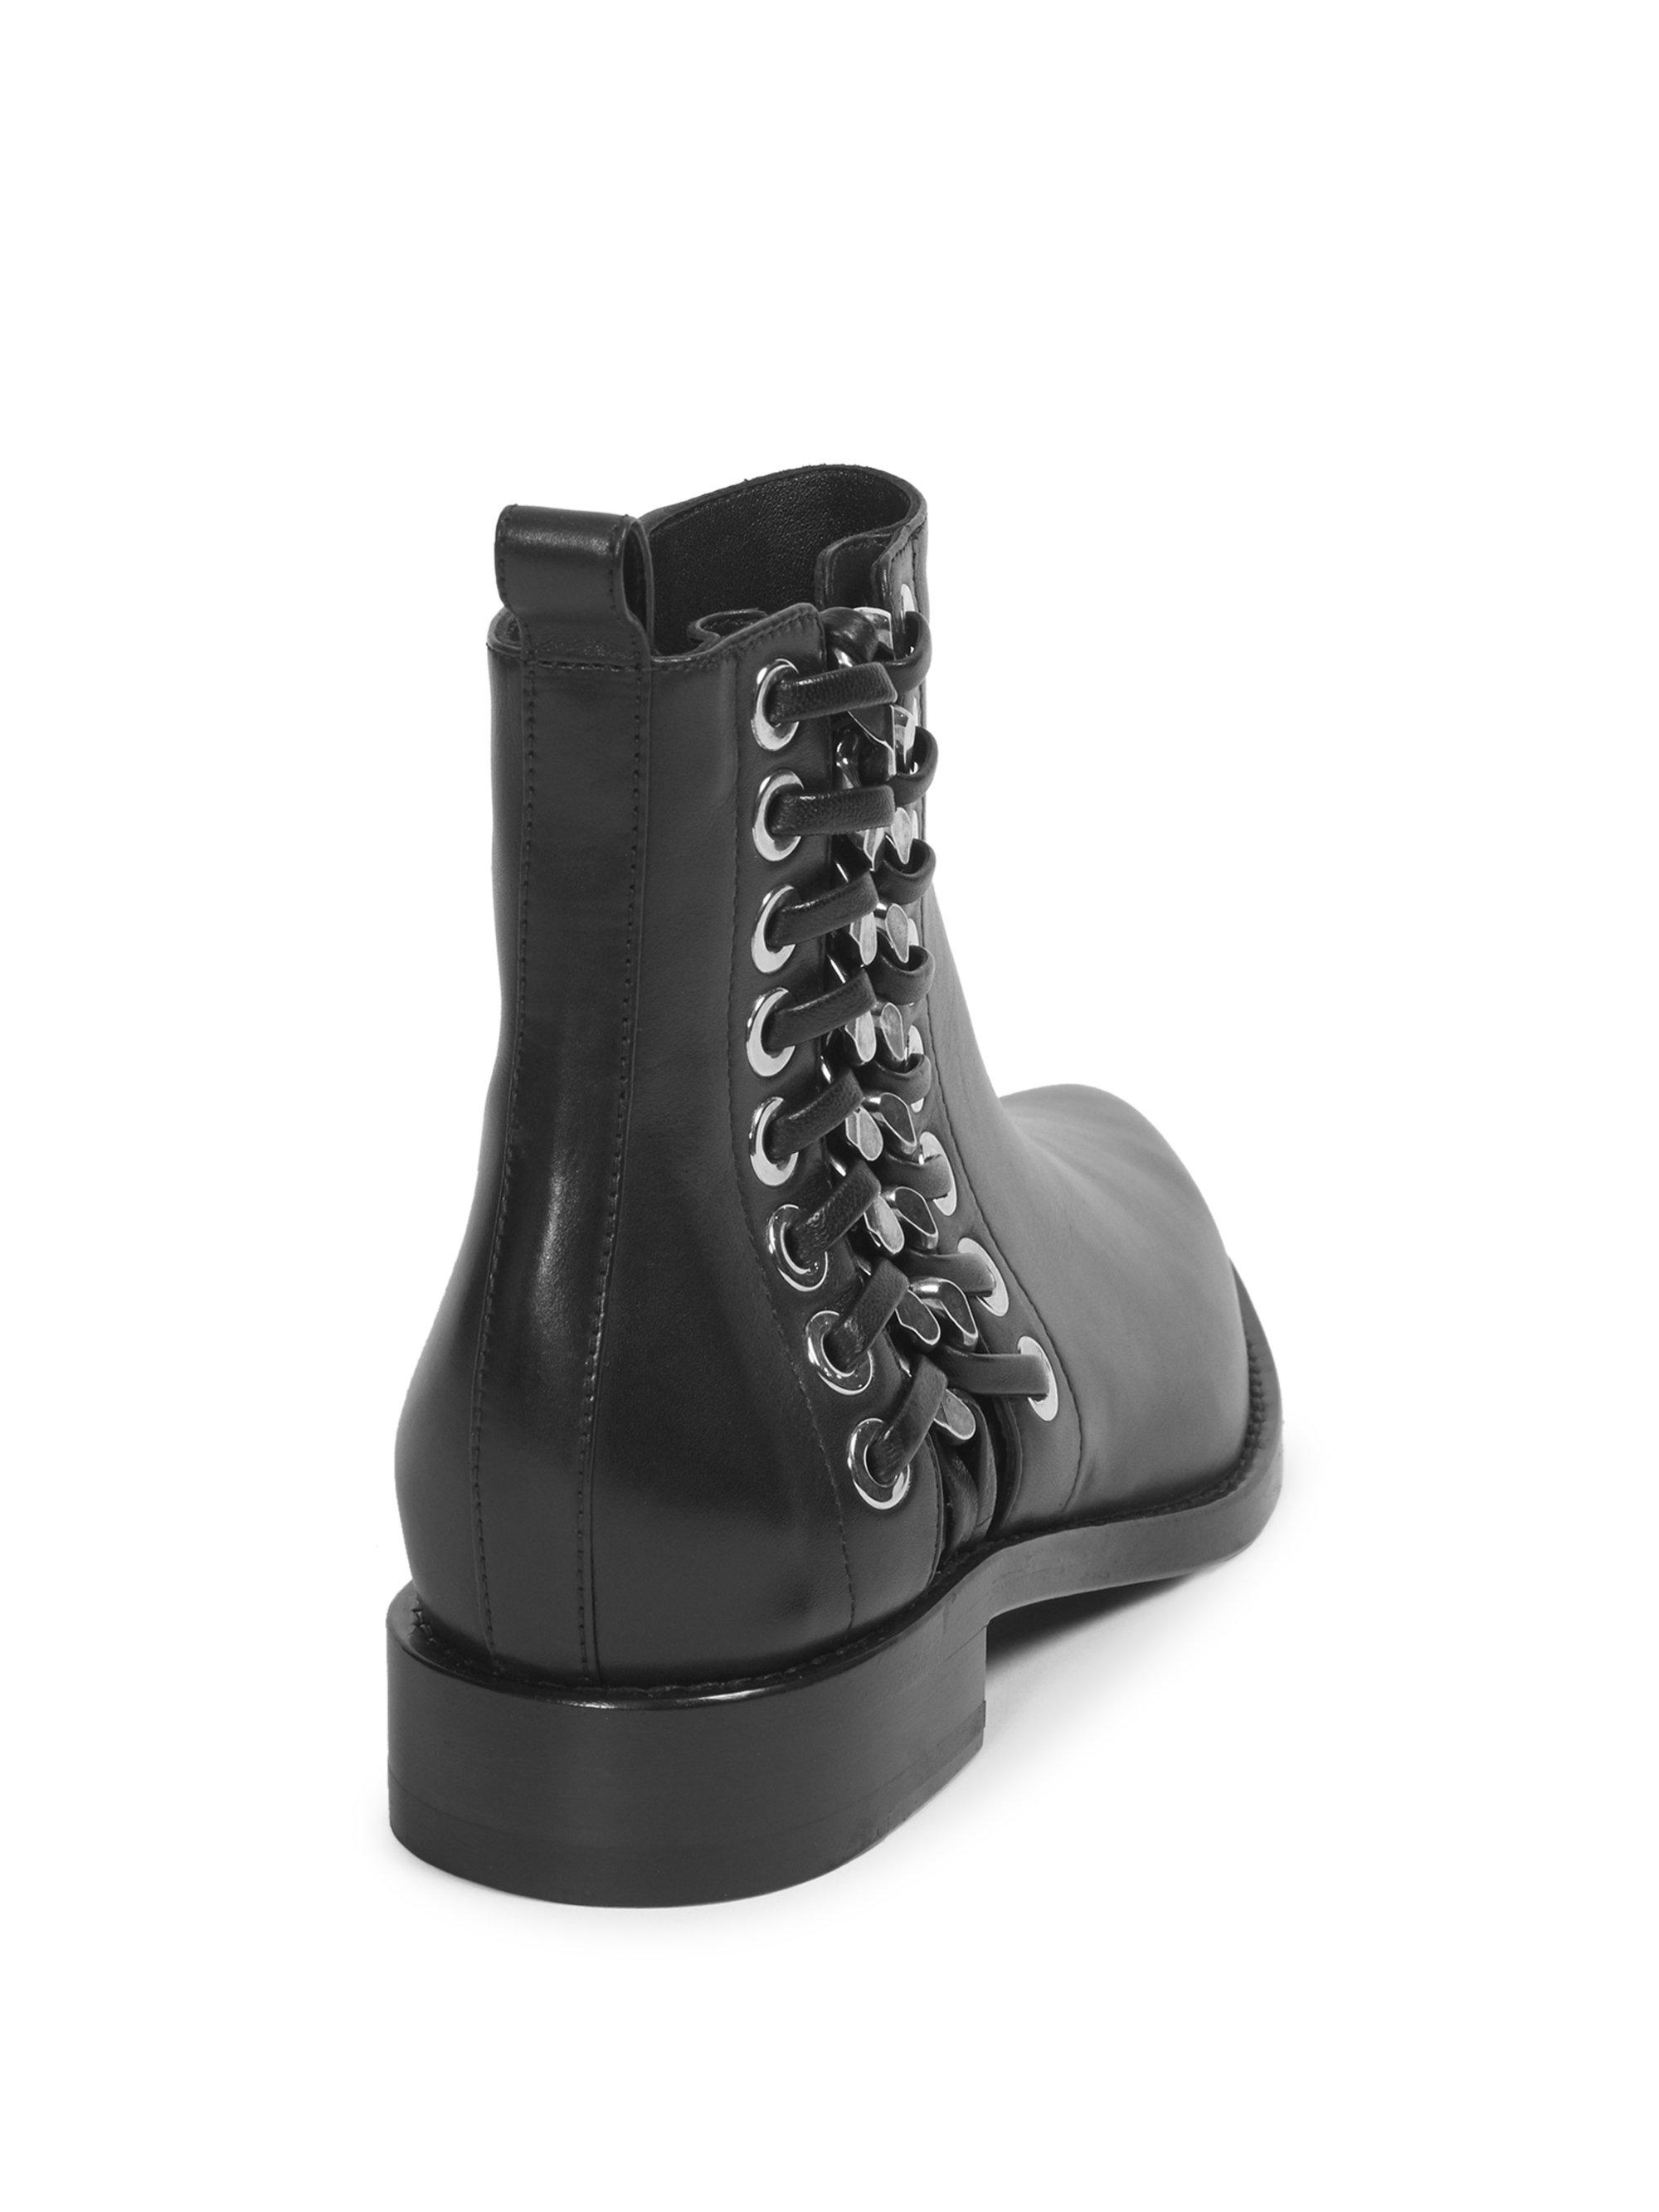 Alexander McQueen Side Detail Leather Booties YKmmjpe